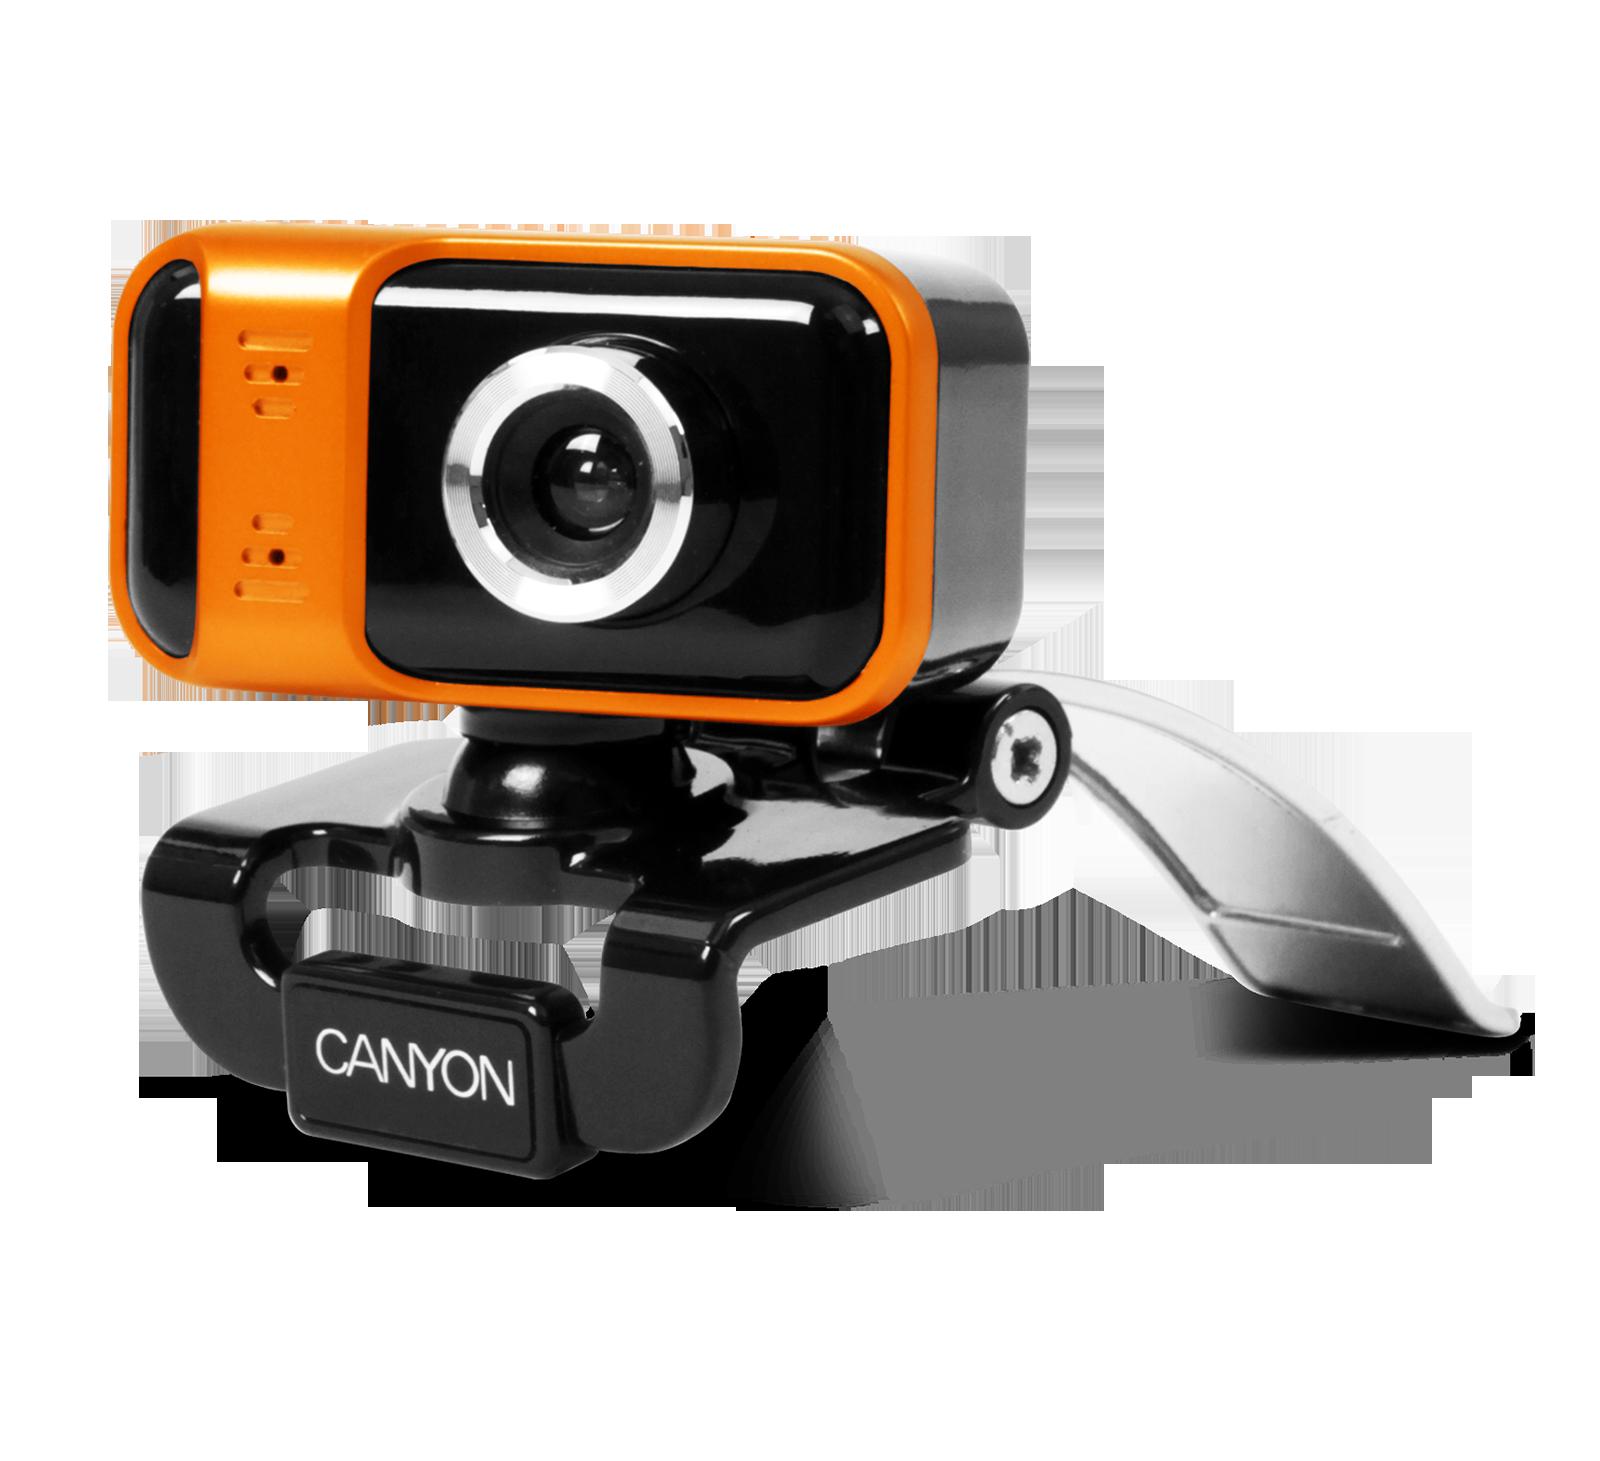 CNR-WCAM913_2h - Web Camera PNG